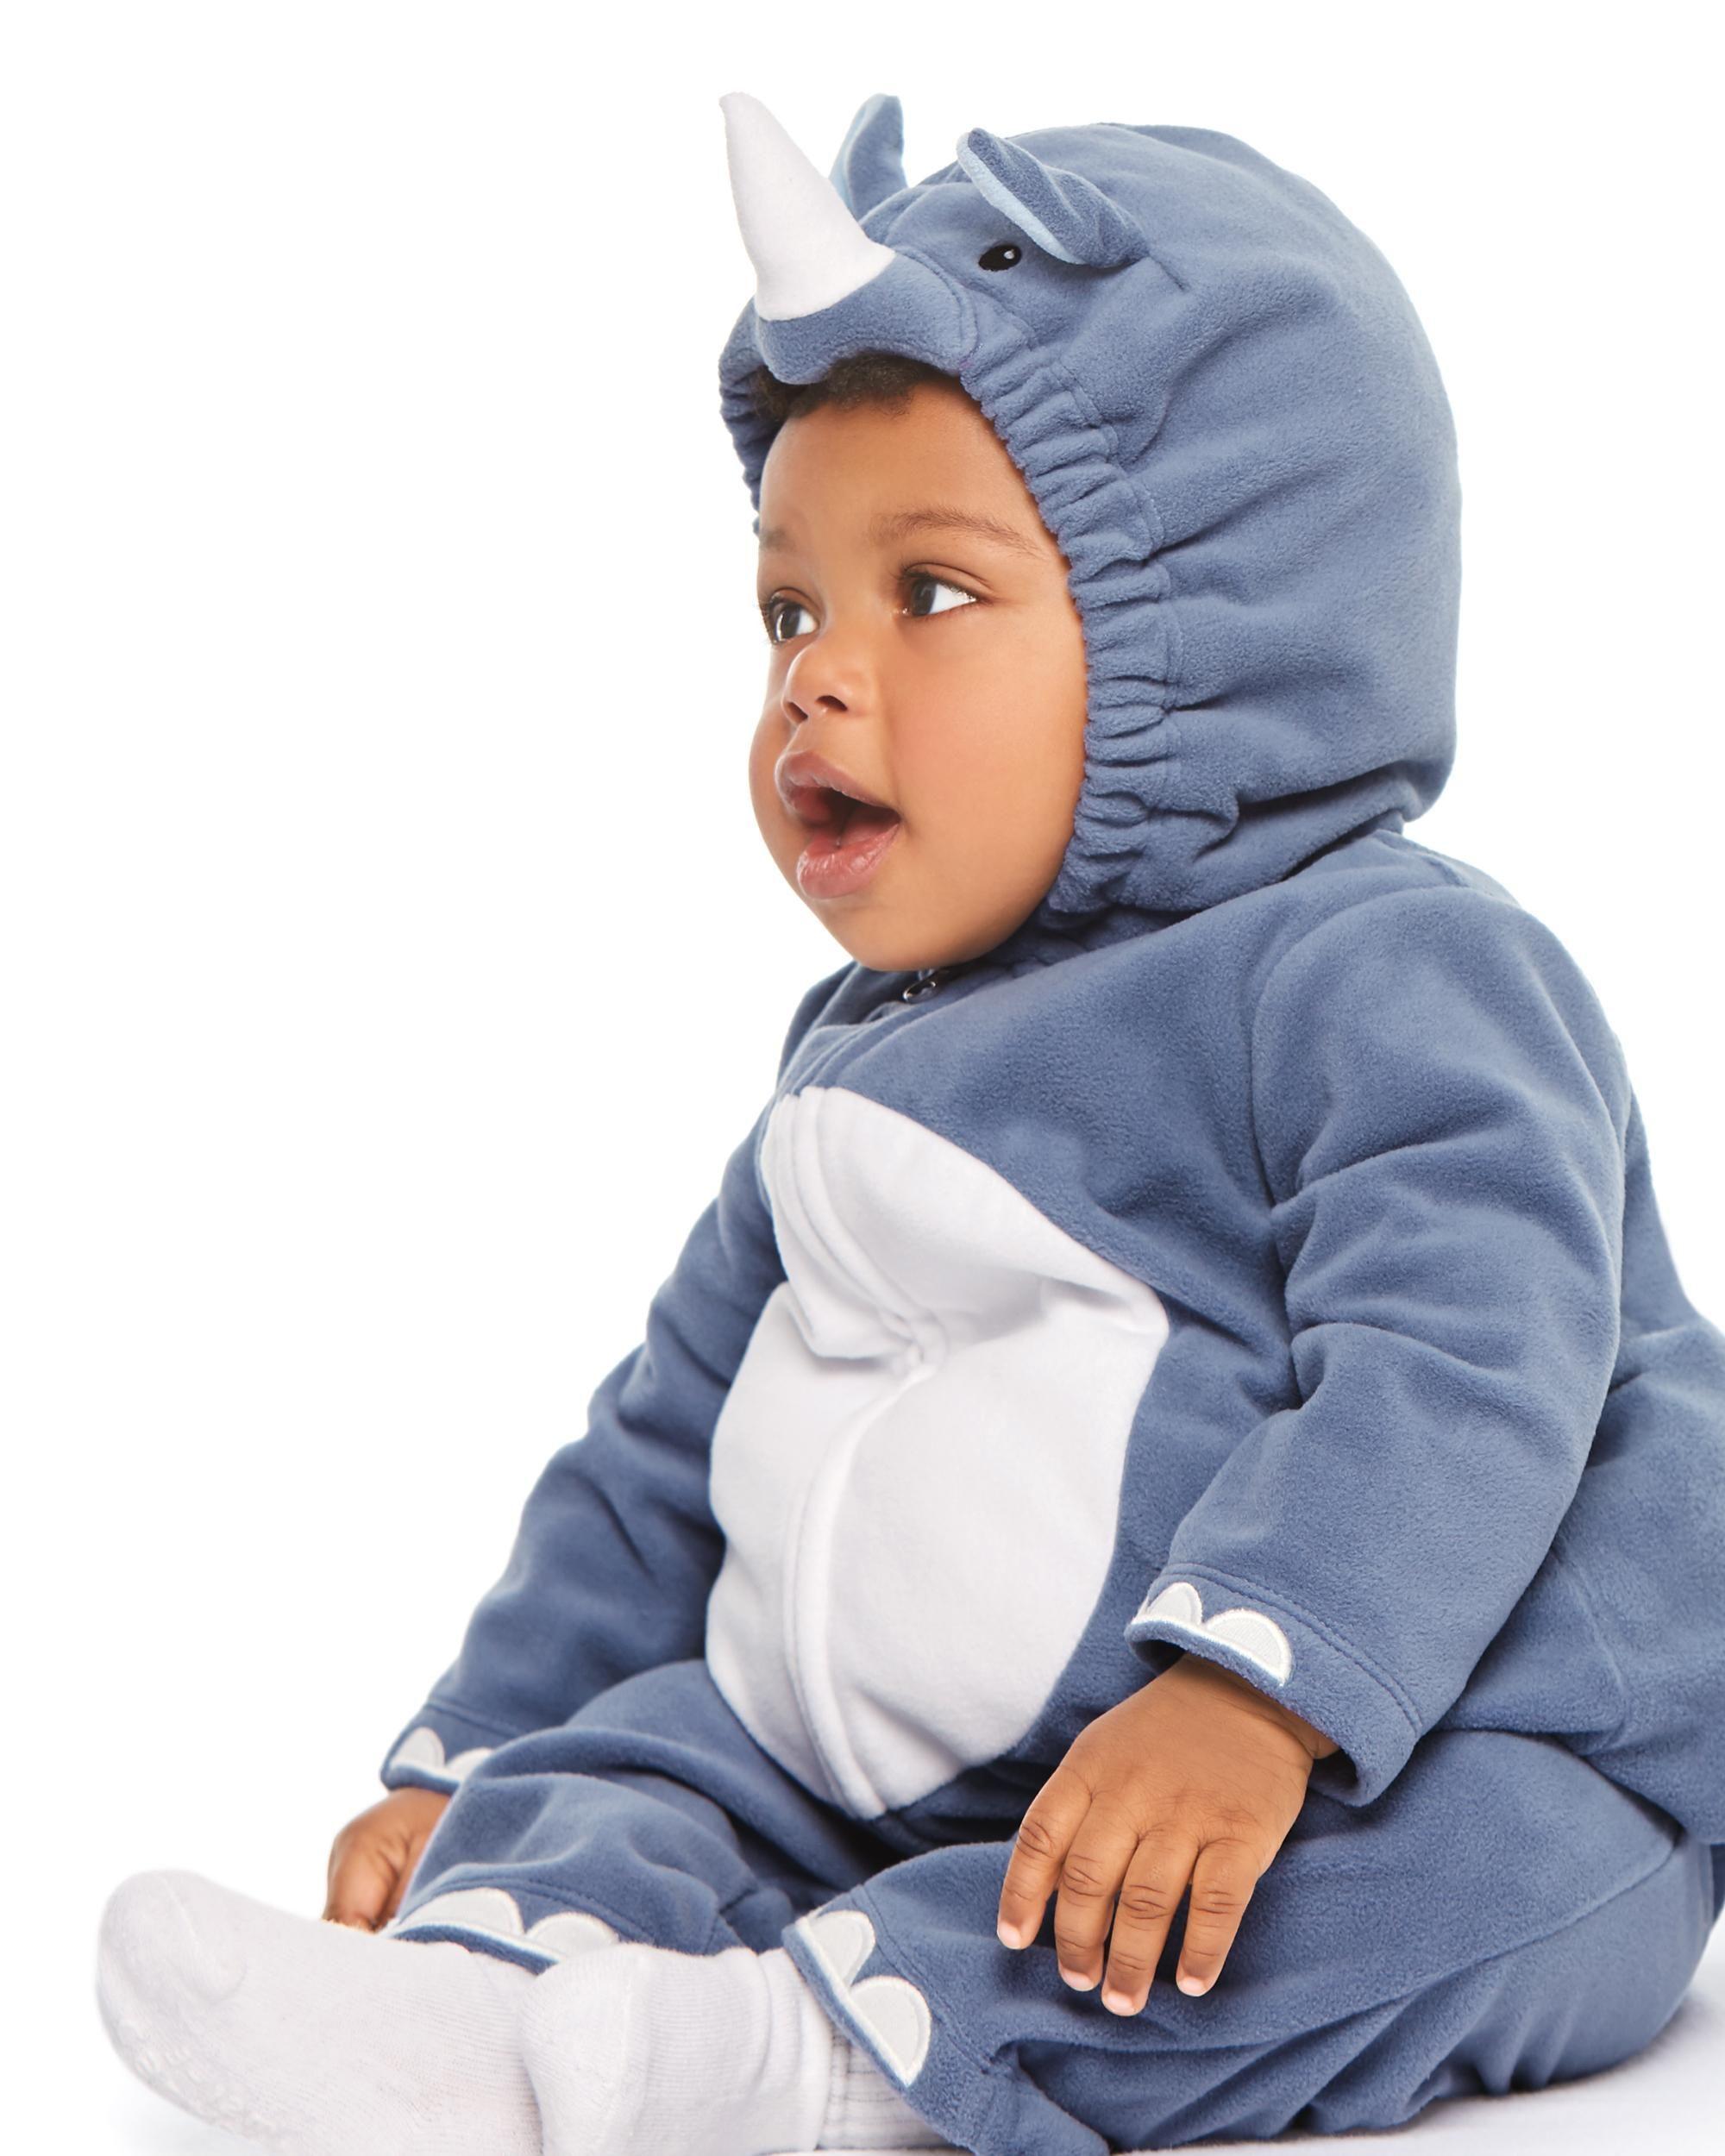 little rhino halloween costume | rhinoceros, costumes and halloween